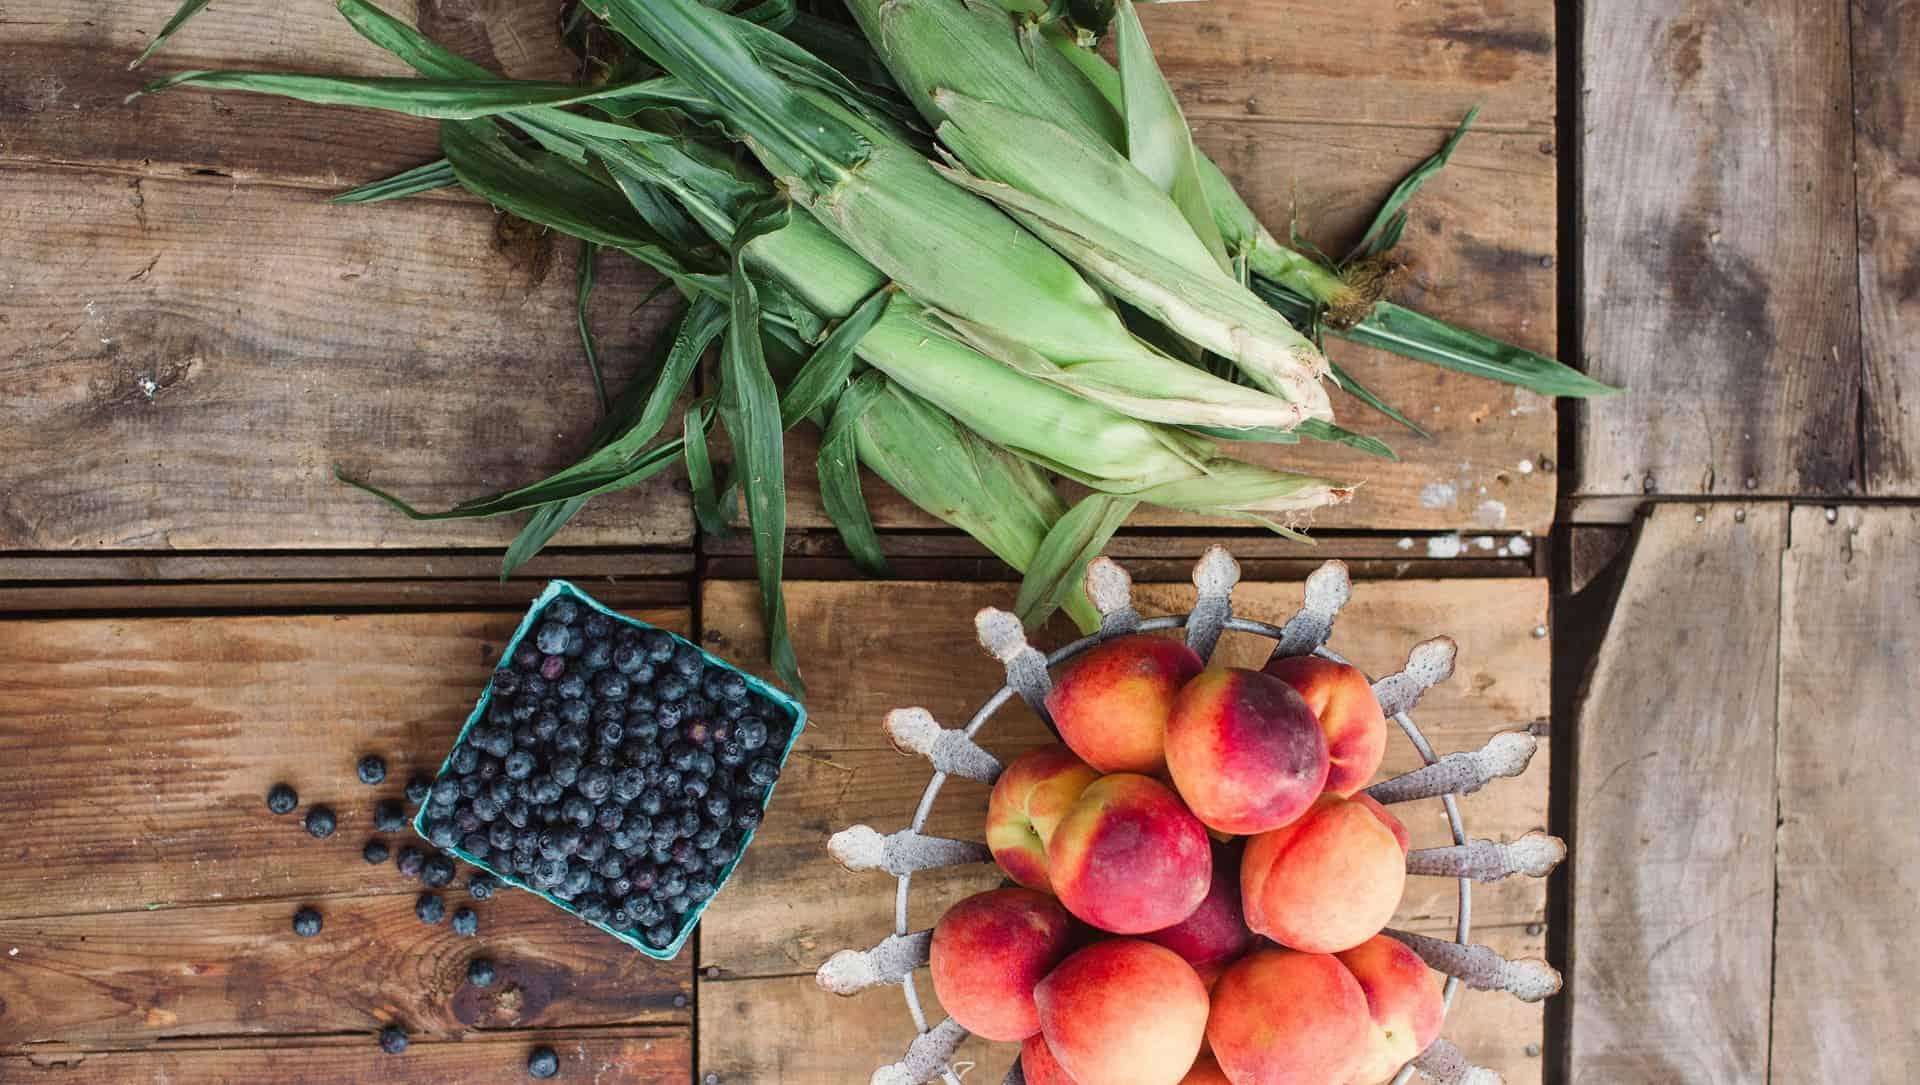 corn Bluberries peaches